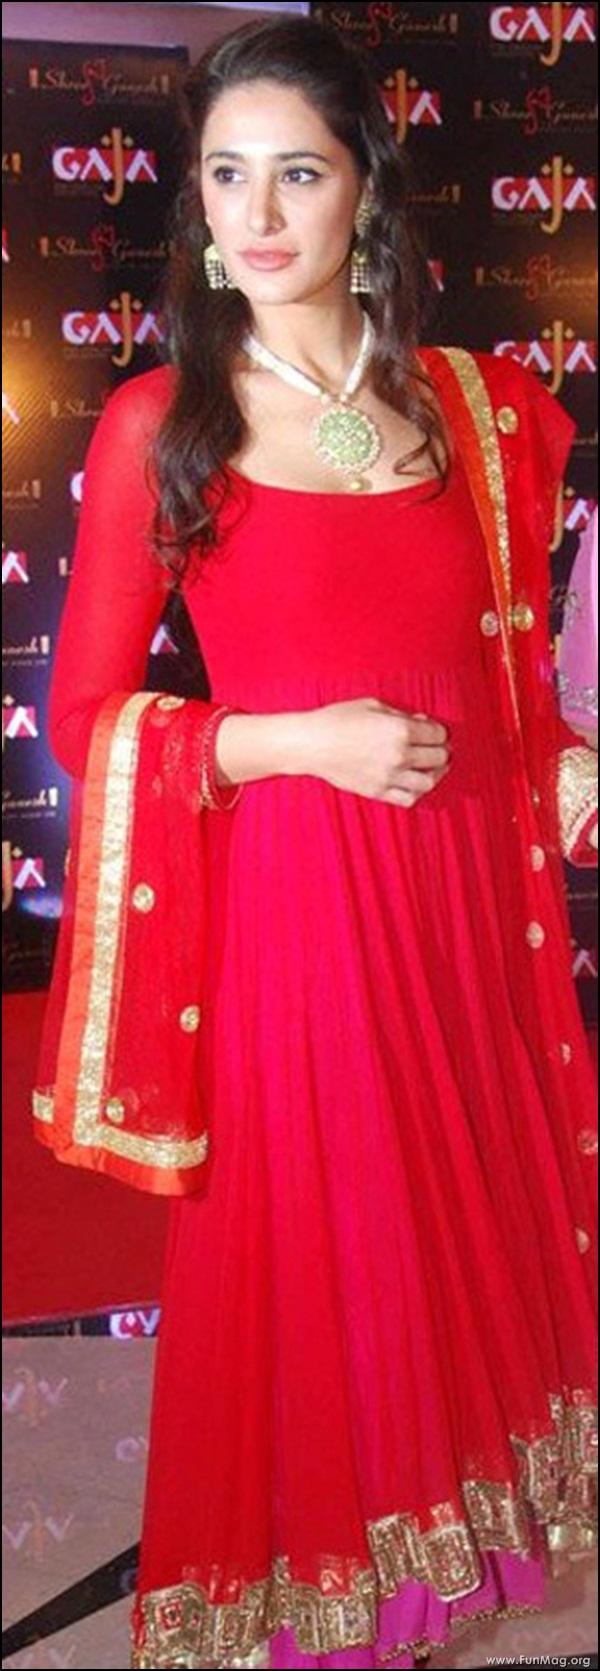 nargis-fakhri-in-red-indian-dress- (20)